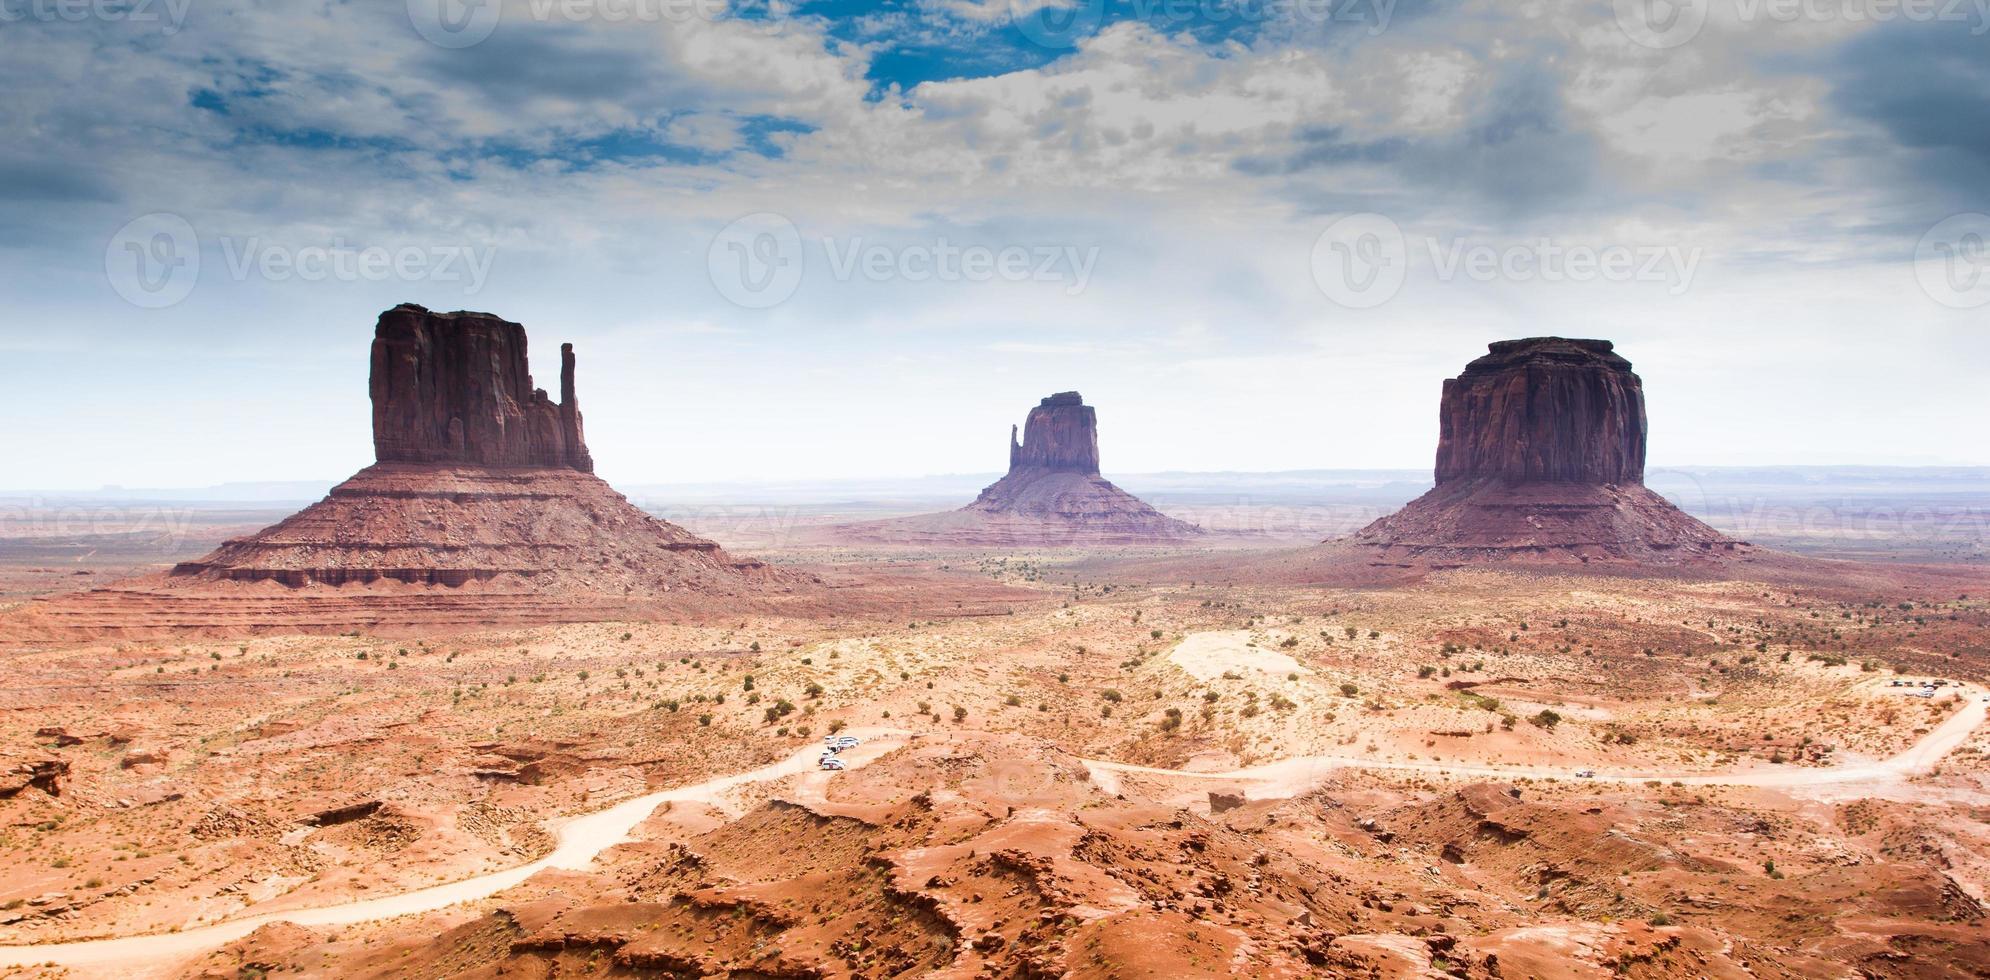 la monument valley, scenics, usa photo